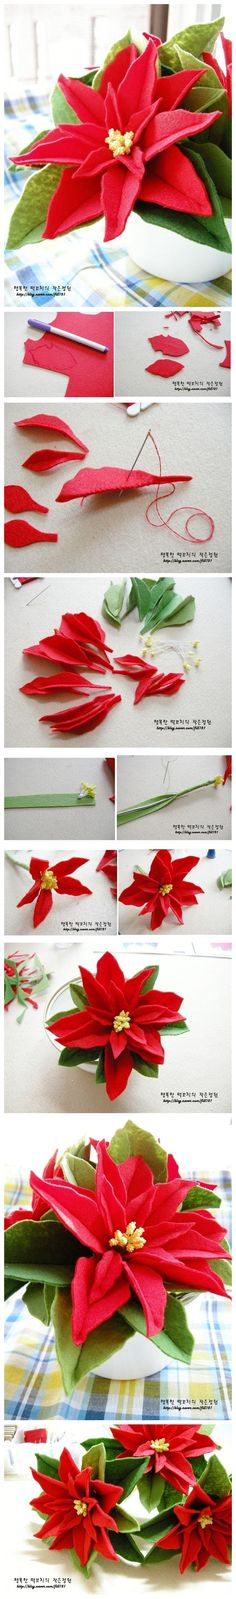 Samples of Felt Flowers Making with Easy Steps - Best Diy And Crafts Felt Flowers, Diy Flowers, Fabric Flowers, Paper Flowers, Flower Diy, Christmas Projects, Felt Crafts, Holiday Crafts, Diy Crafts